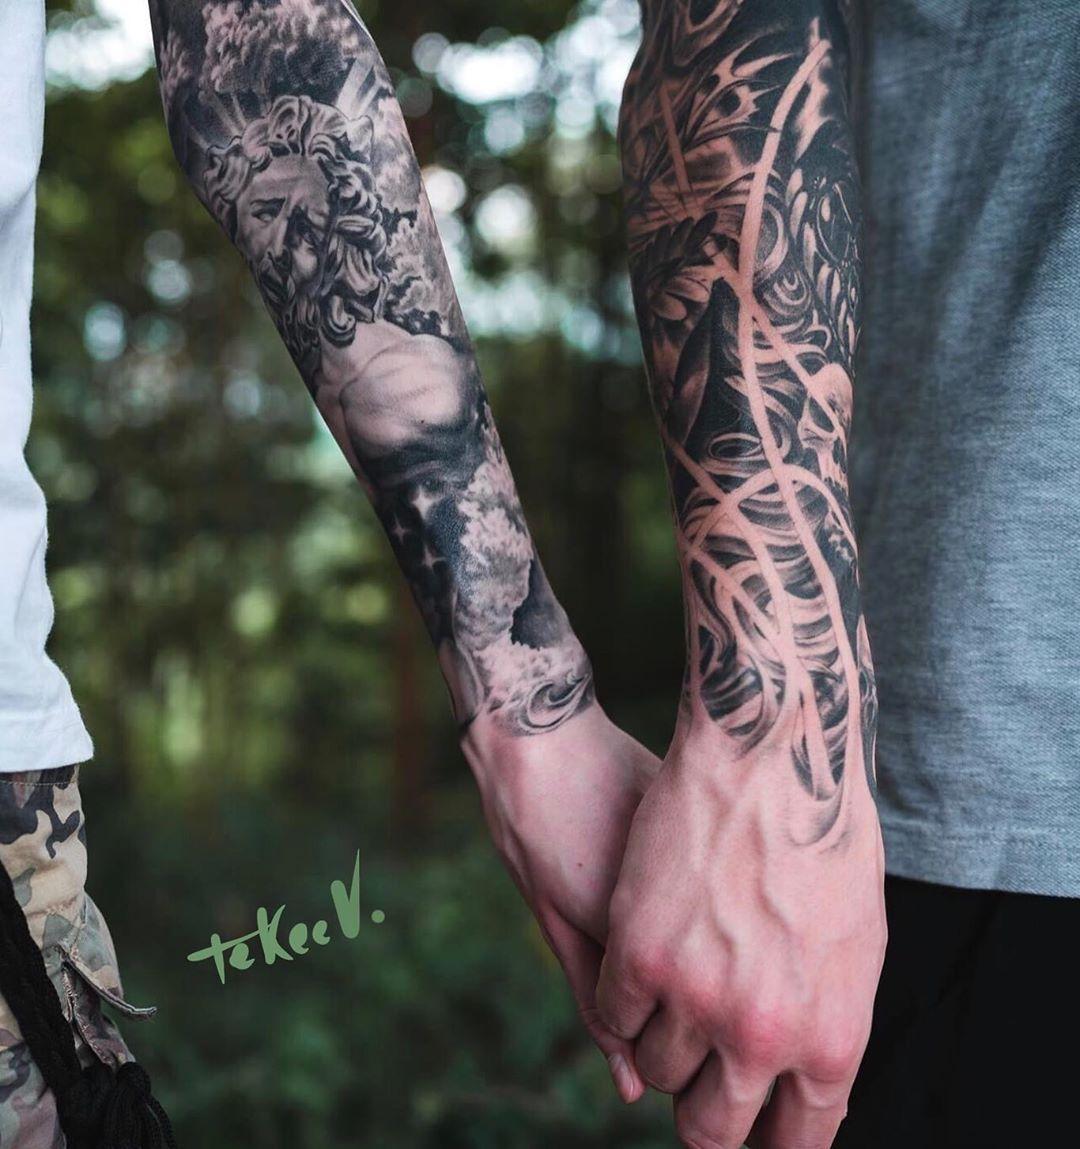 My friends! Healed sleeves #tekeevtattoo #tattooomsk #omsktattoo #tattoomsk #tattoobali #balitattoo #balitattooartist #baliindonesia #berlintattoo #tattooberlin #tattoosleeve #tattoosleeves #sleevetattoo #sleeves #tattooblackandgrey #blackandwhite #blackandgrey #blackandgreytattoo #blackandgreyink #blackandgreytattoos #blackandgreyrealism #blackandgreysleeve #blackandgreytattooartist #blackandgreyartist #realismtattoo #realismtattoos #liketattoo #tattooinsta #tattooinstagram #instatattoo